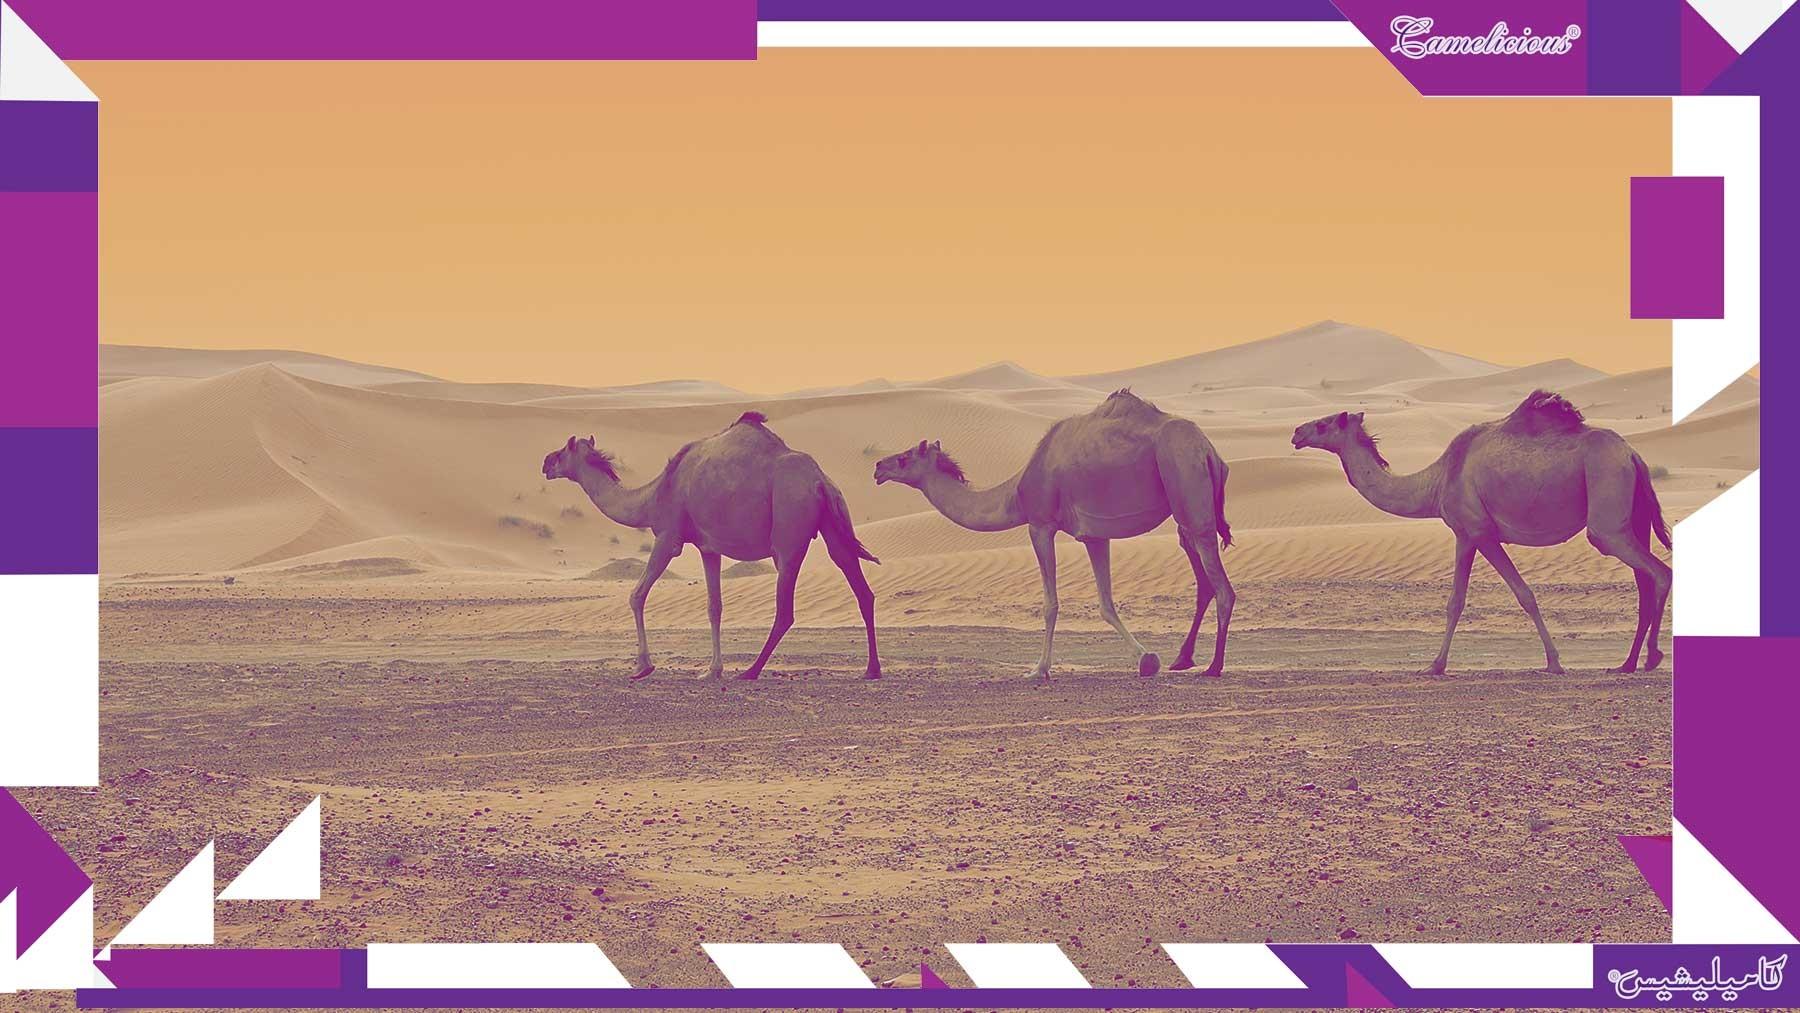 Dubai's camel milk products reach Europe